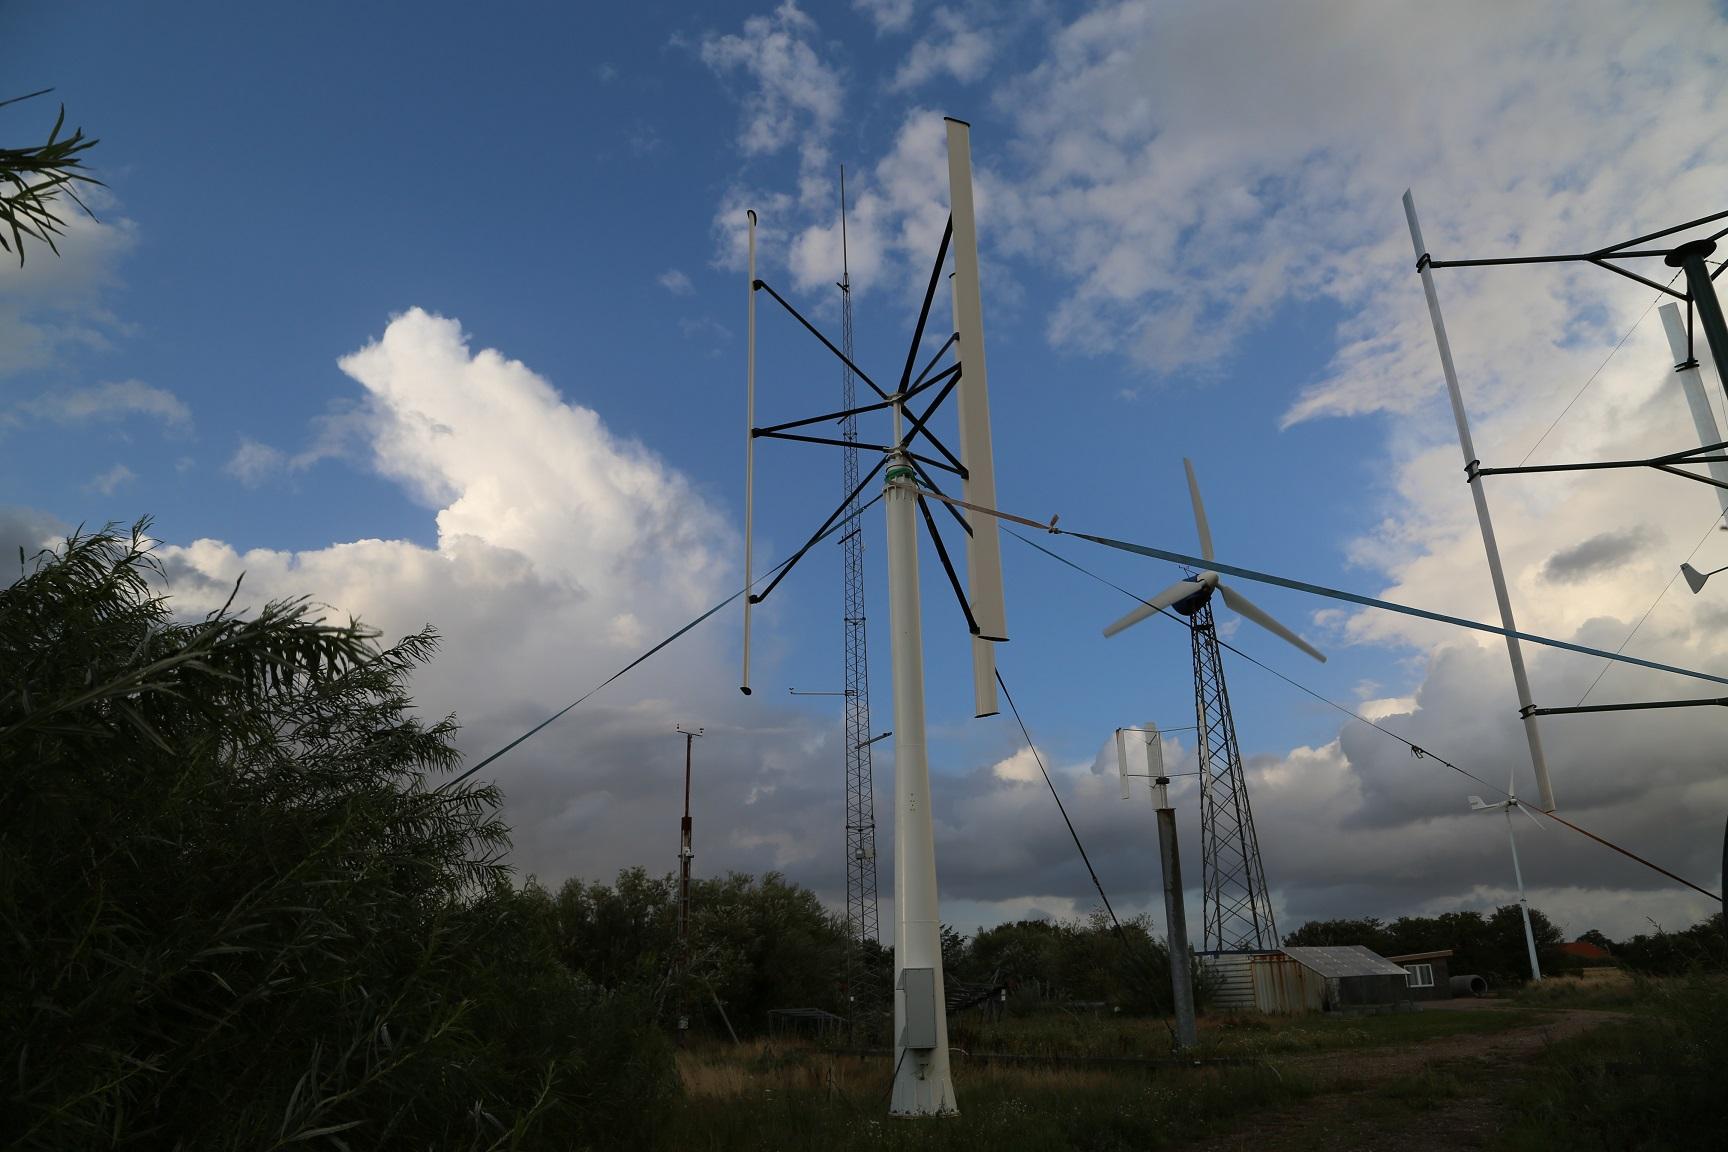 Haue Eco Sign / Vertical Axis Wind Turbine Generator - Wind turbine